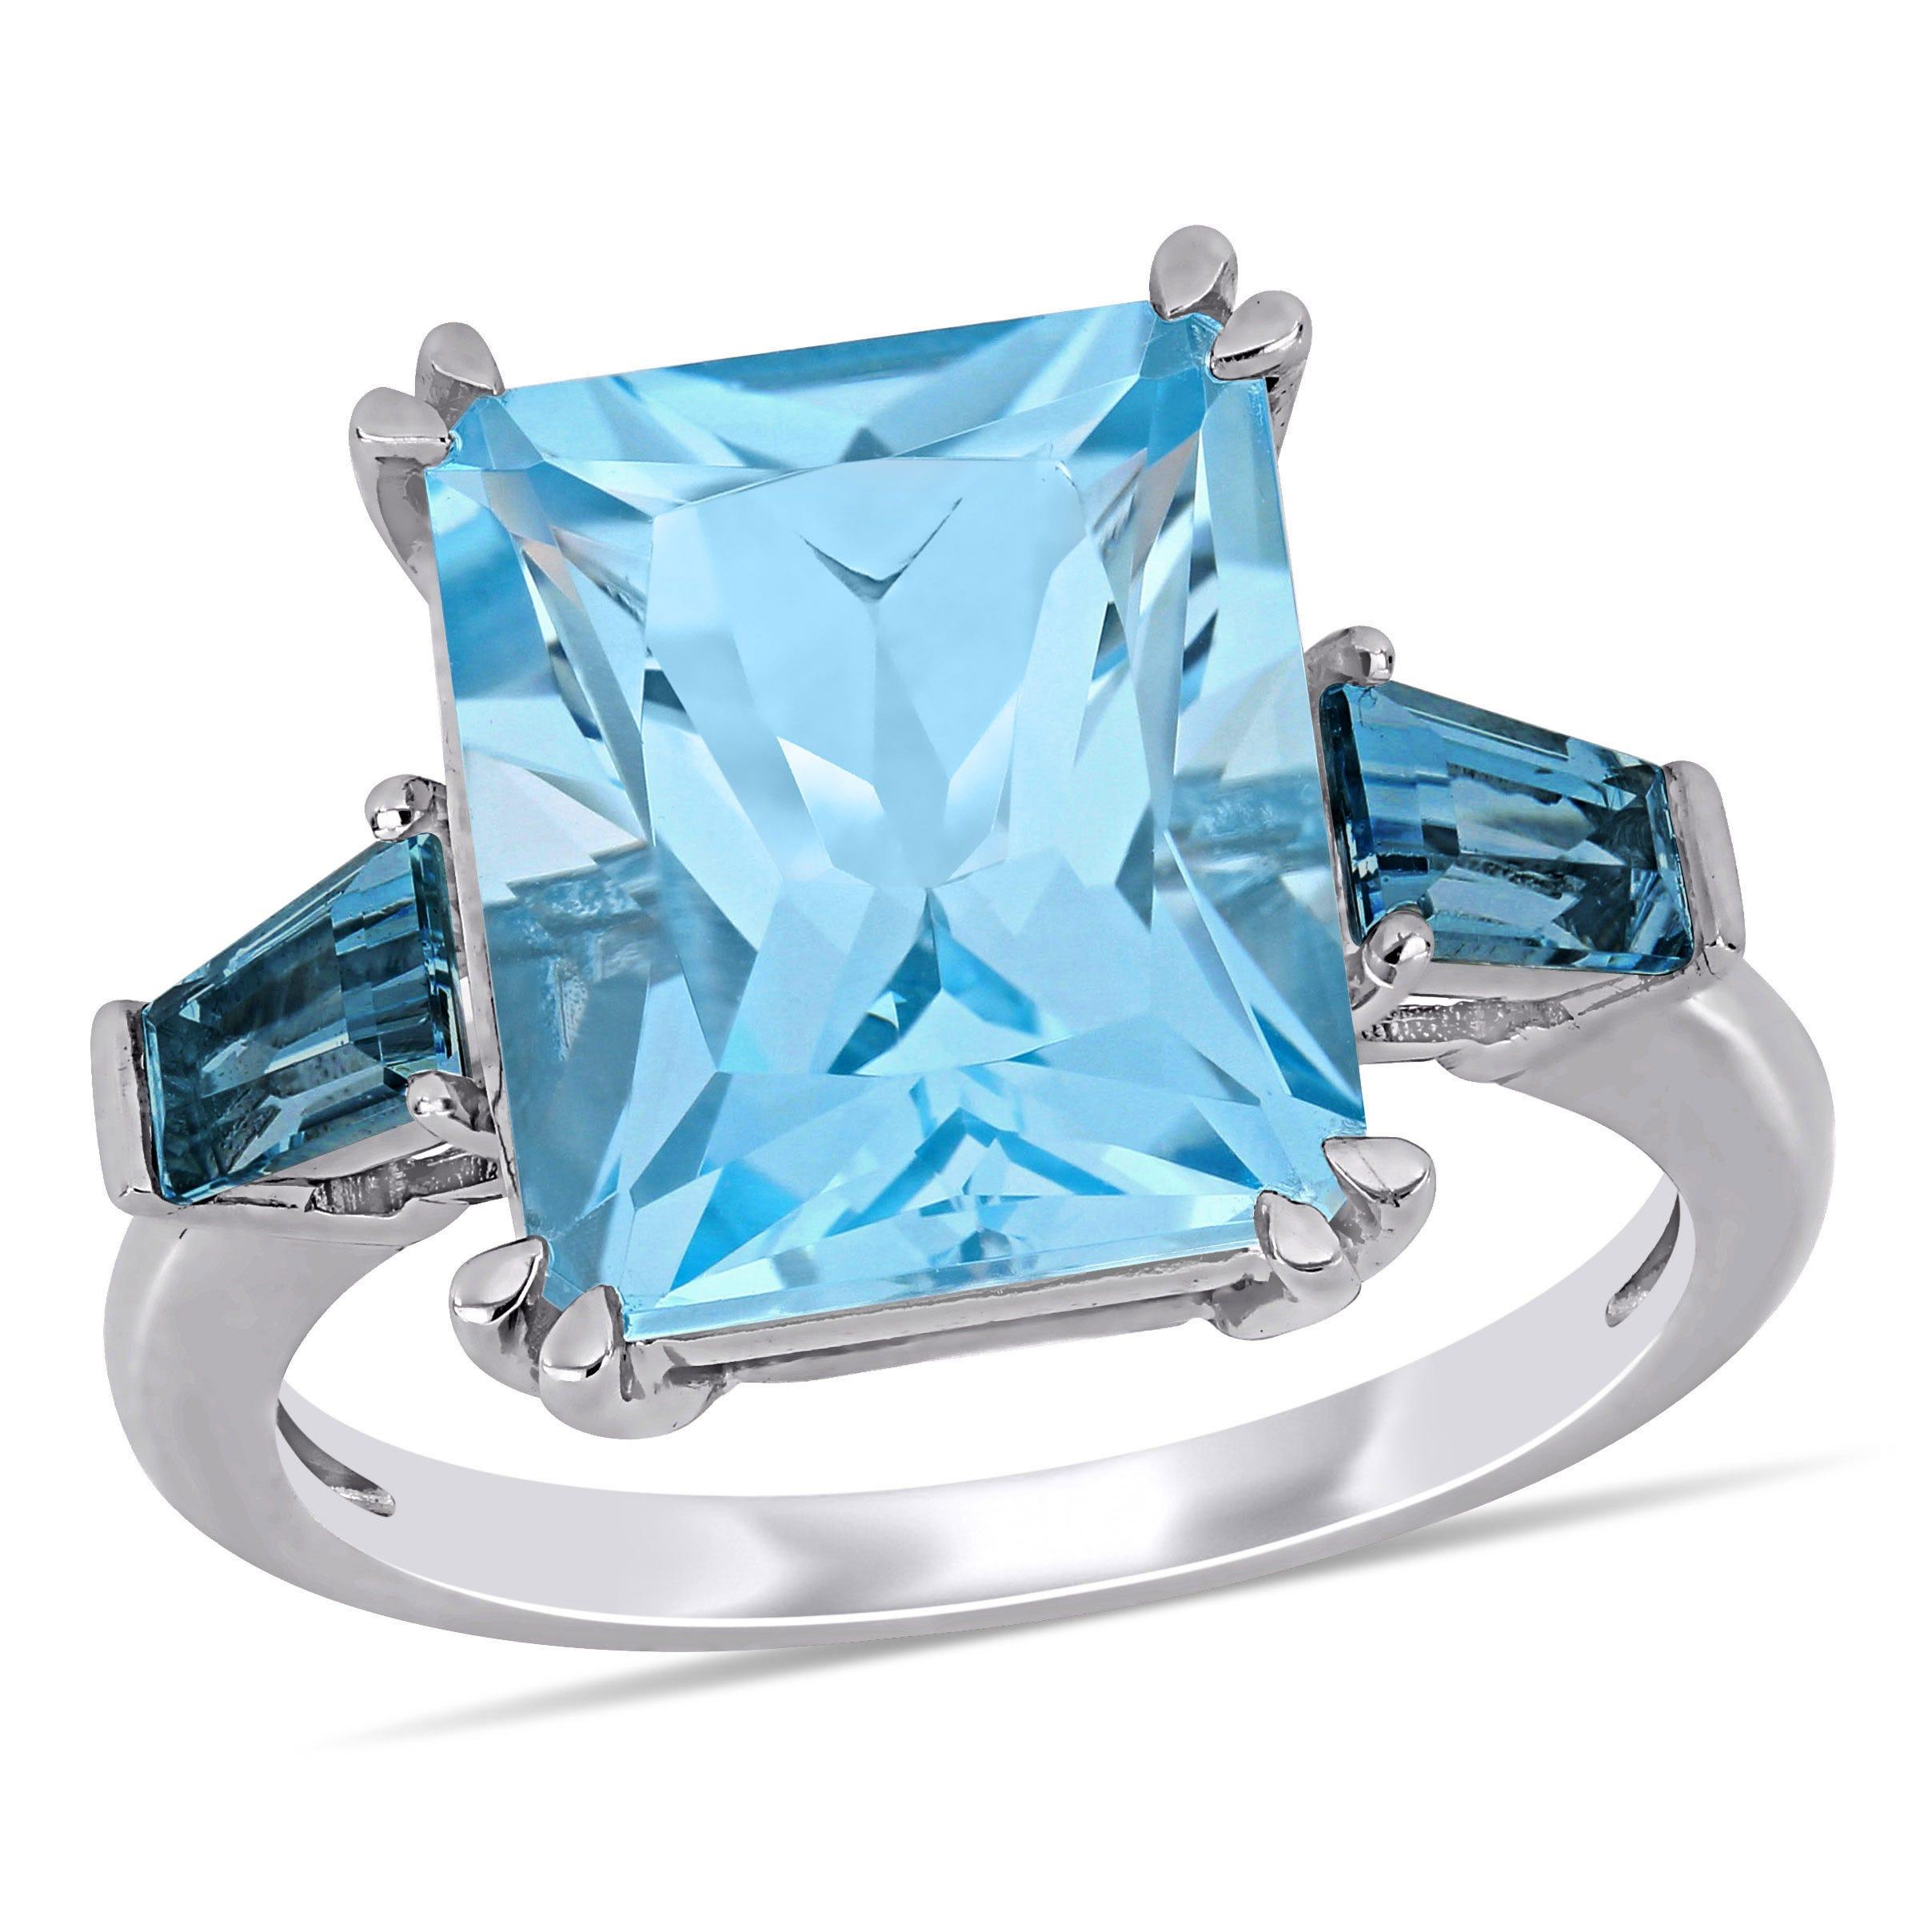 Sky Blue Topaz Ring in 14k White Gold